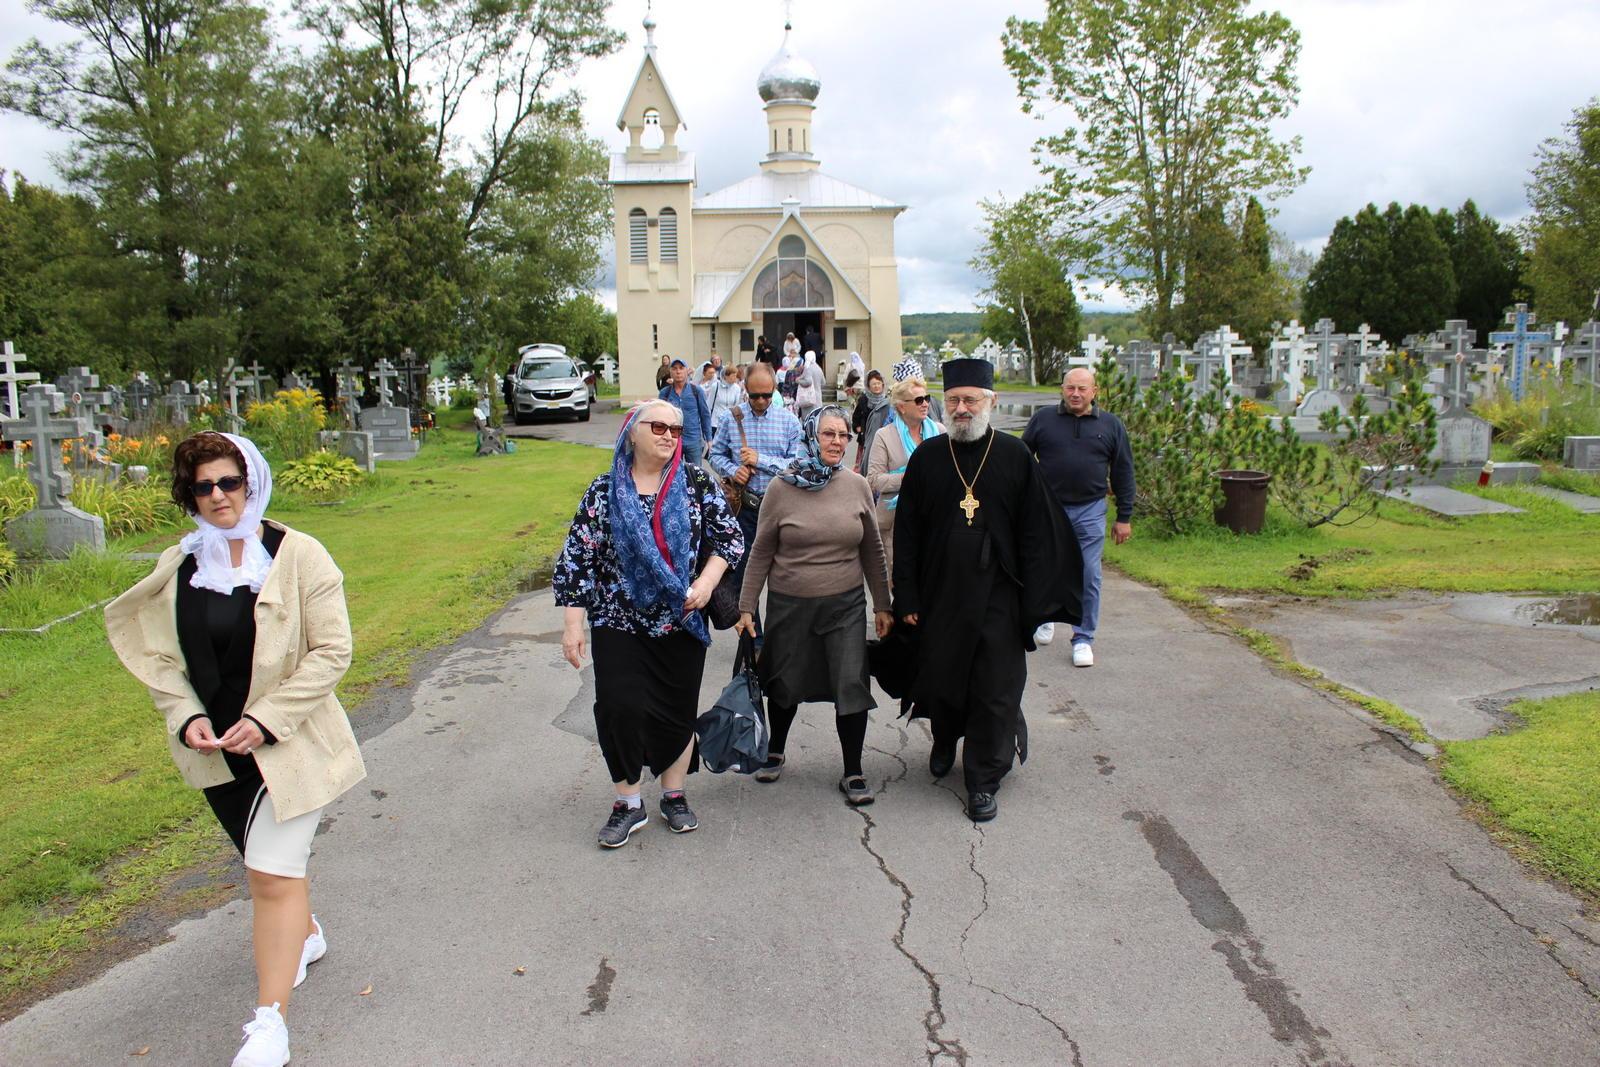 St-Trinity-monastery_02-Sept-2019_3-d-day_71